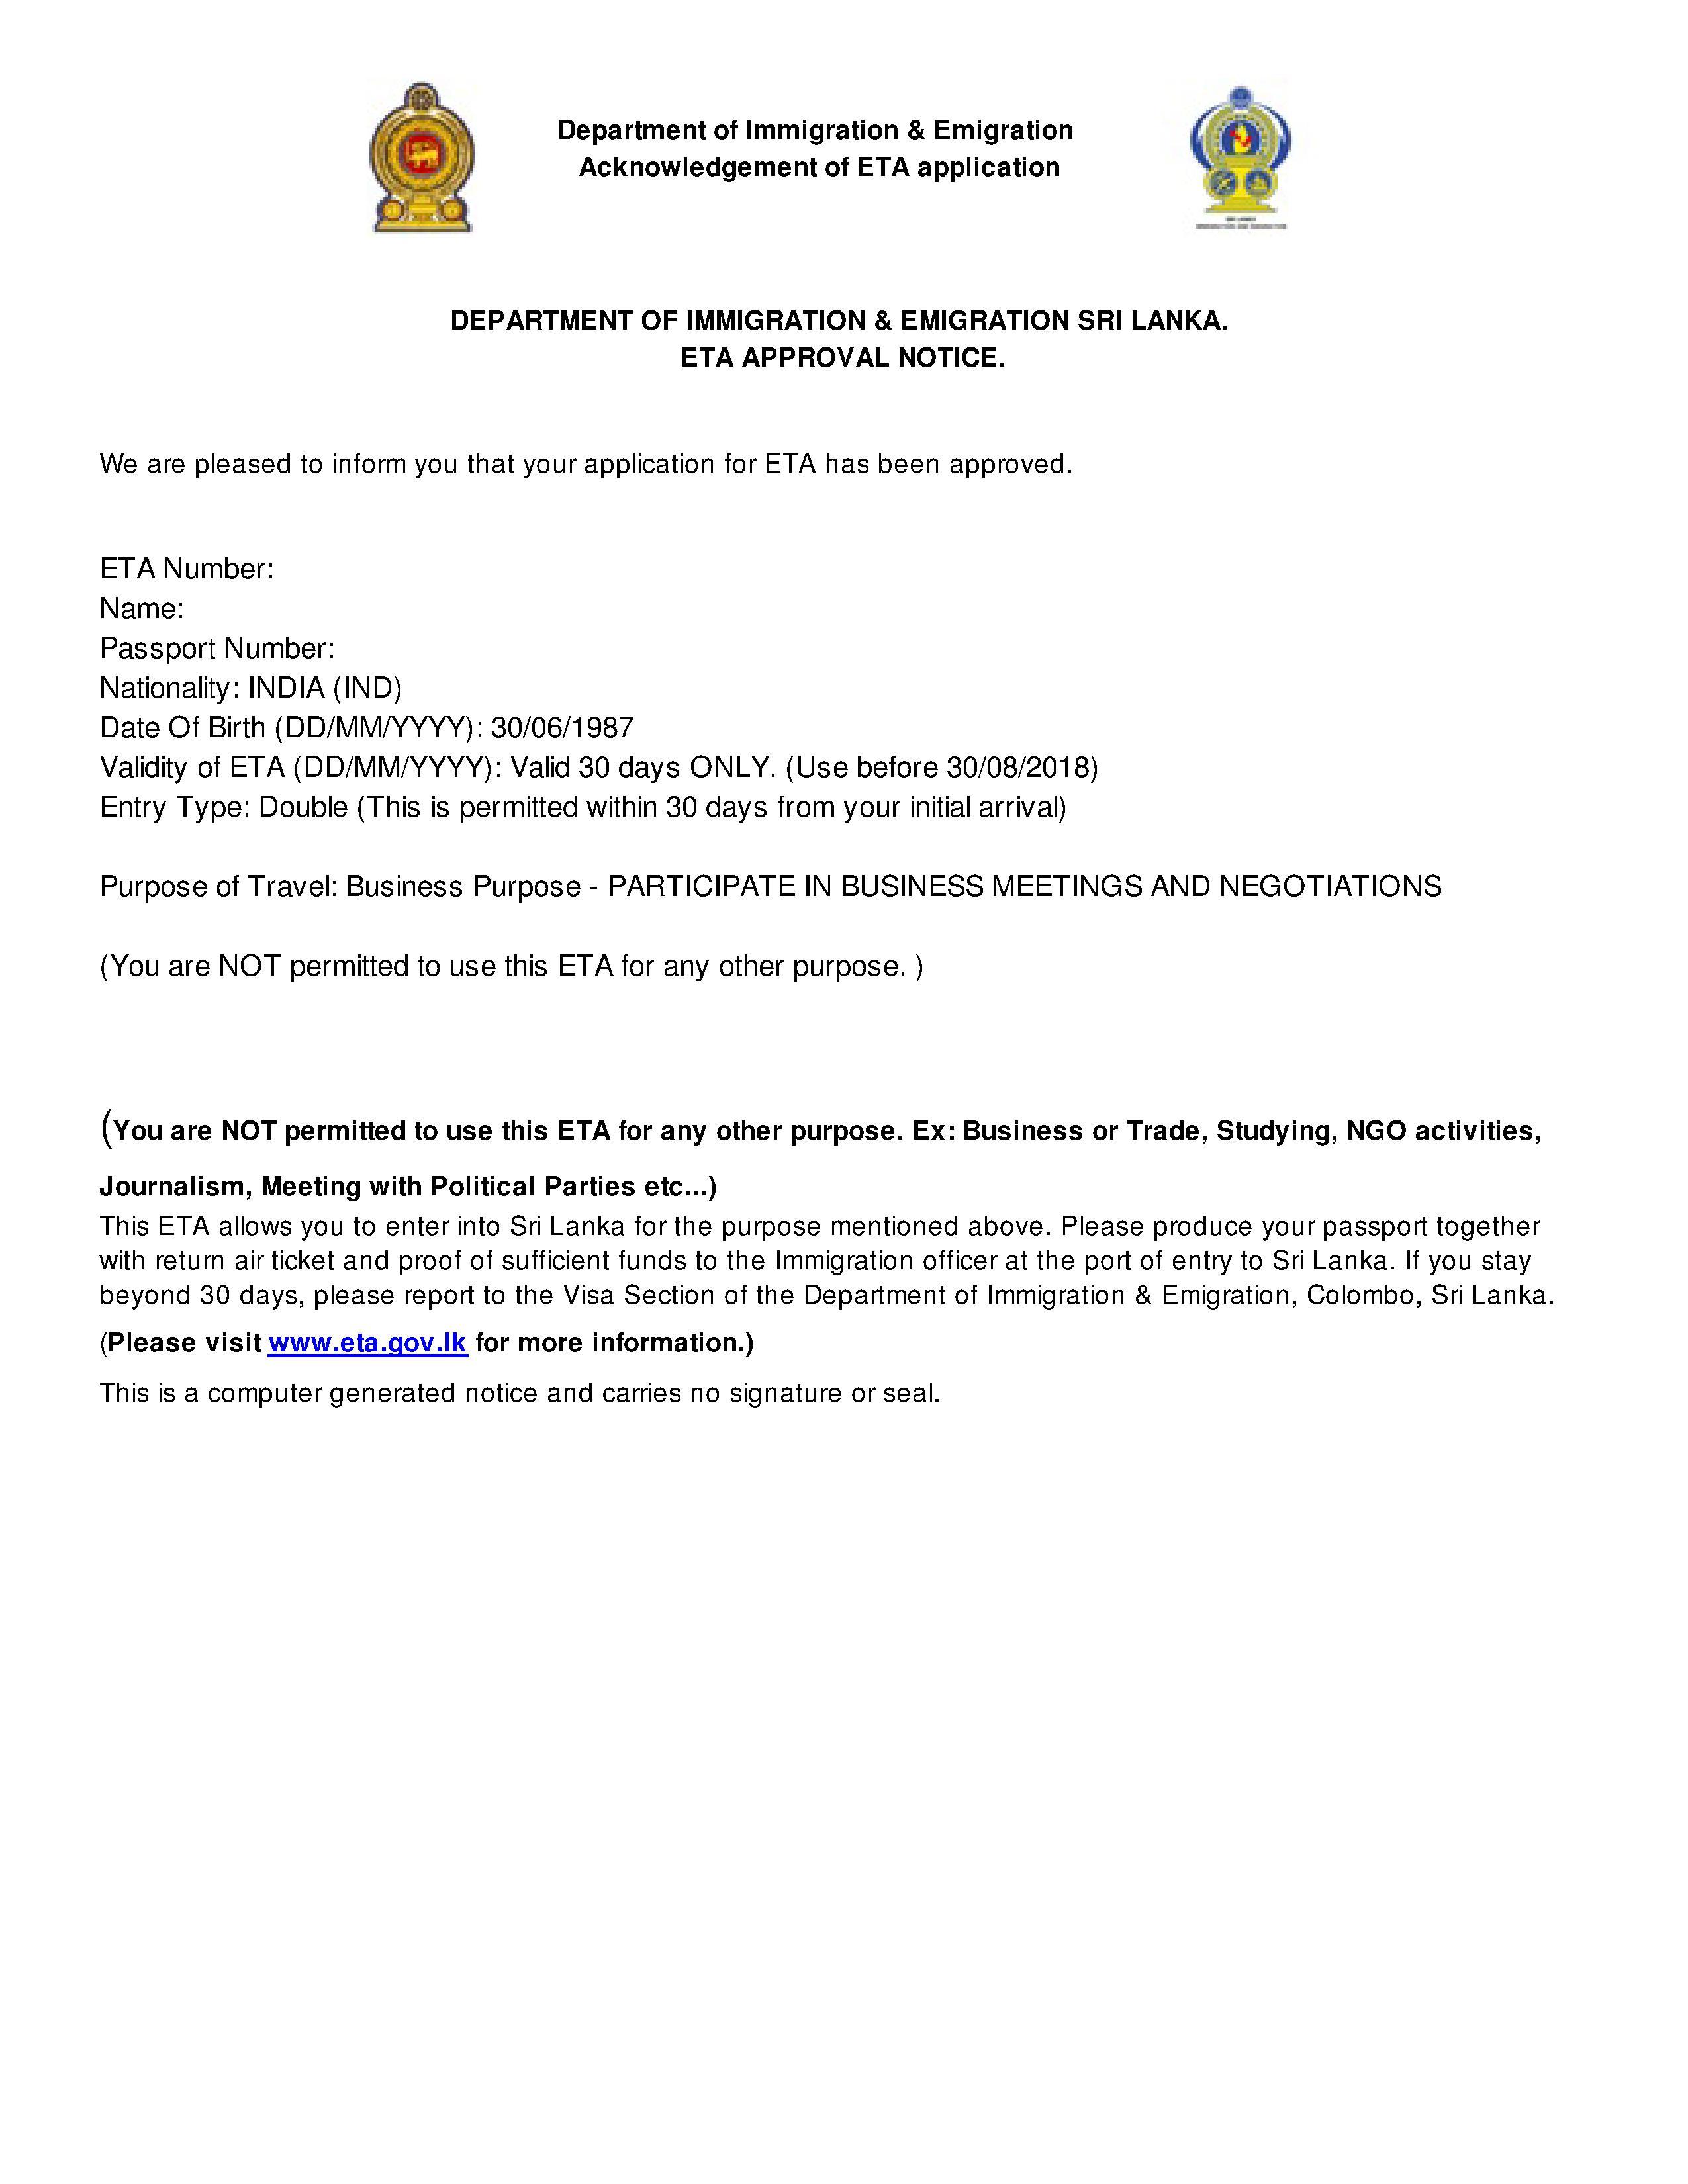 British Embassy Bahrain Visa Application Form